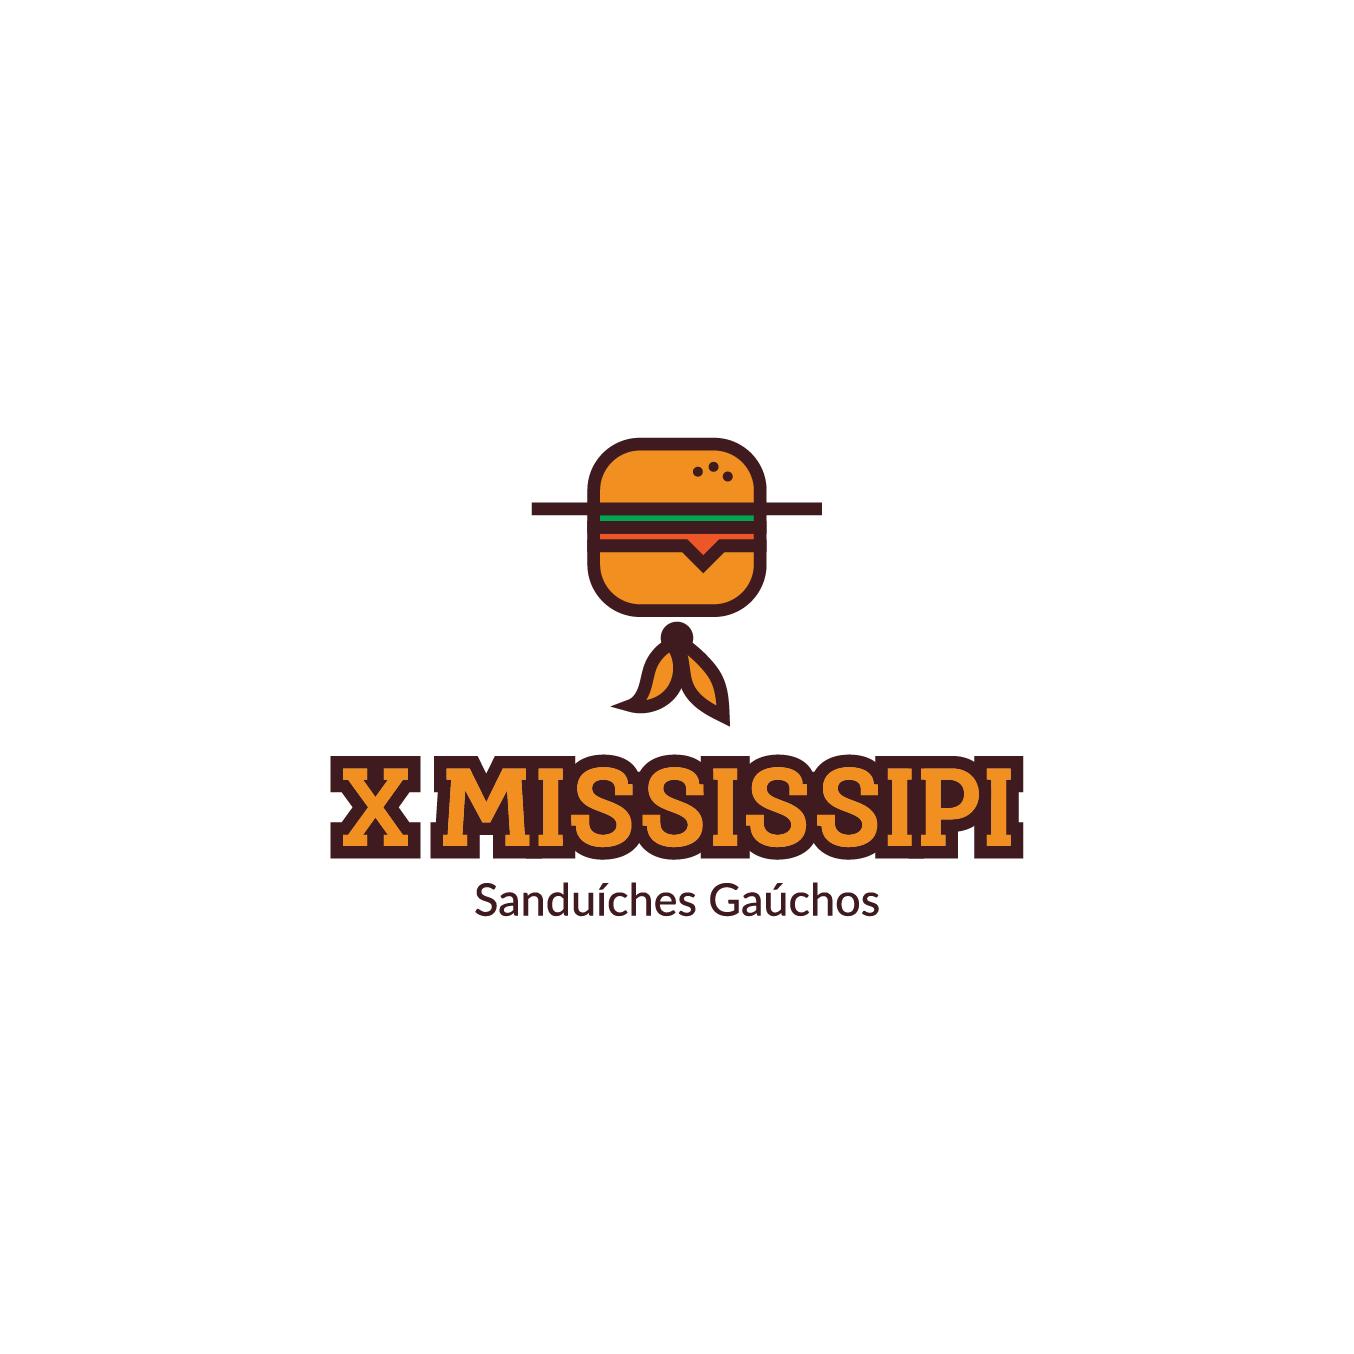 Marca X Mississippi